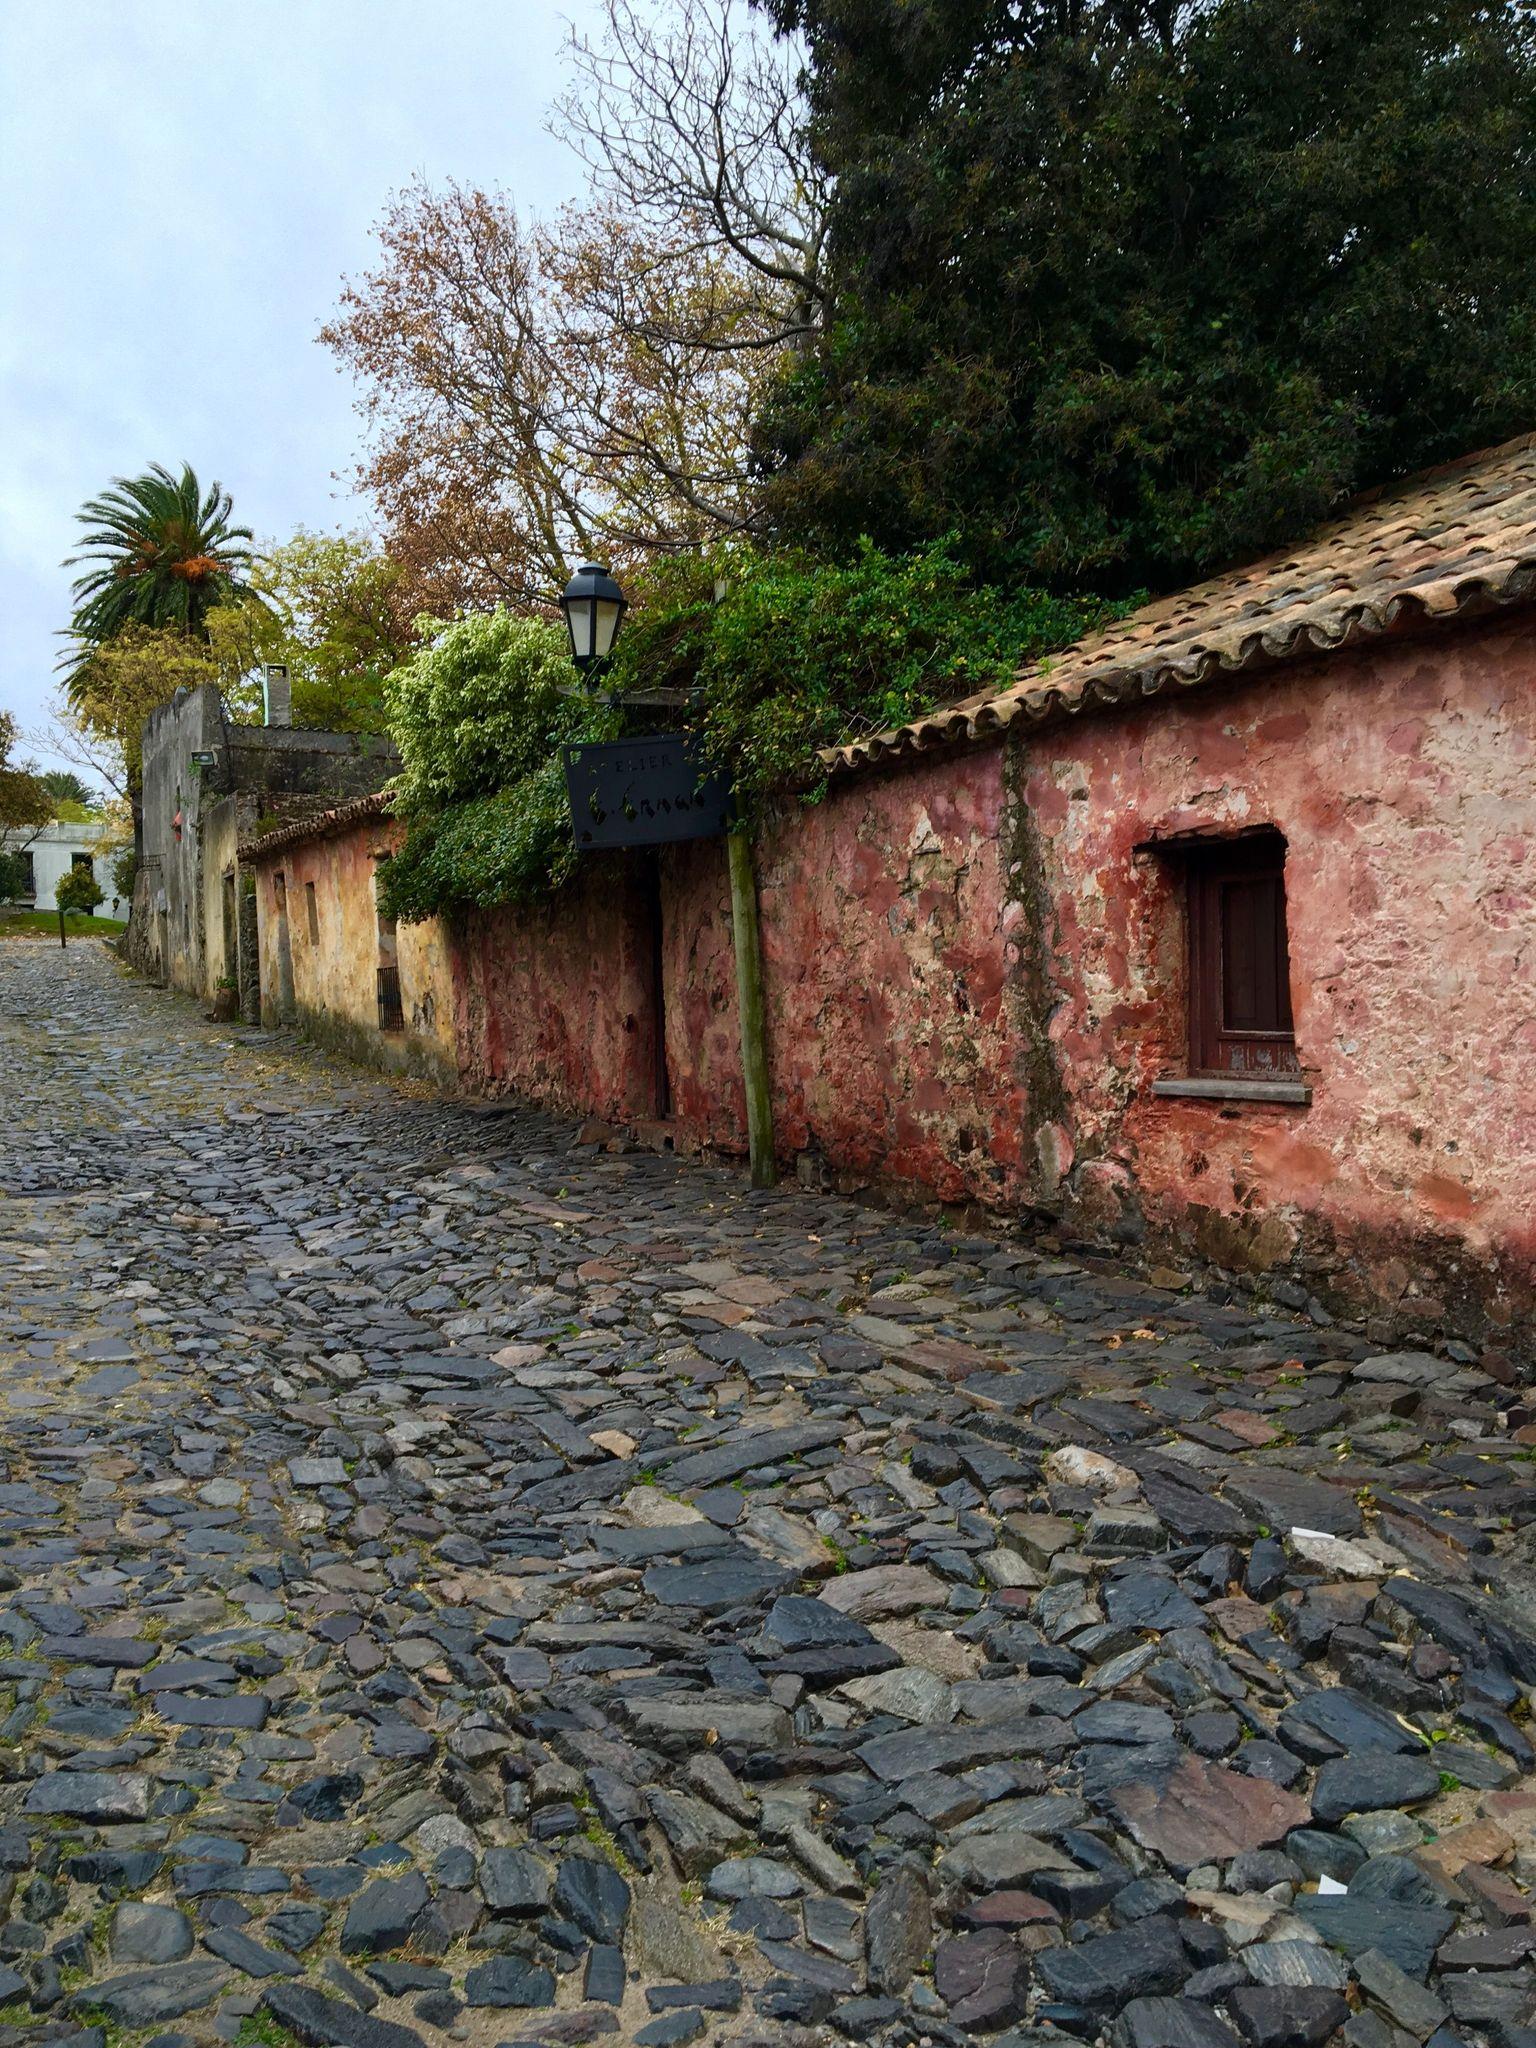 MORE PHOTOS, Private Tour: Colonia del Sacramento Day Trip from Buenos Aires